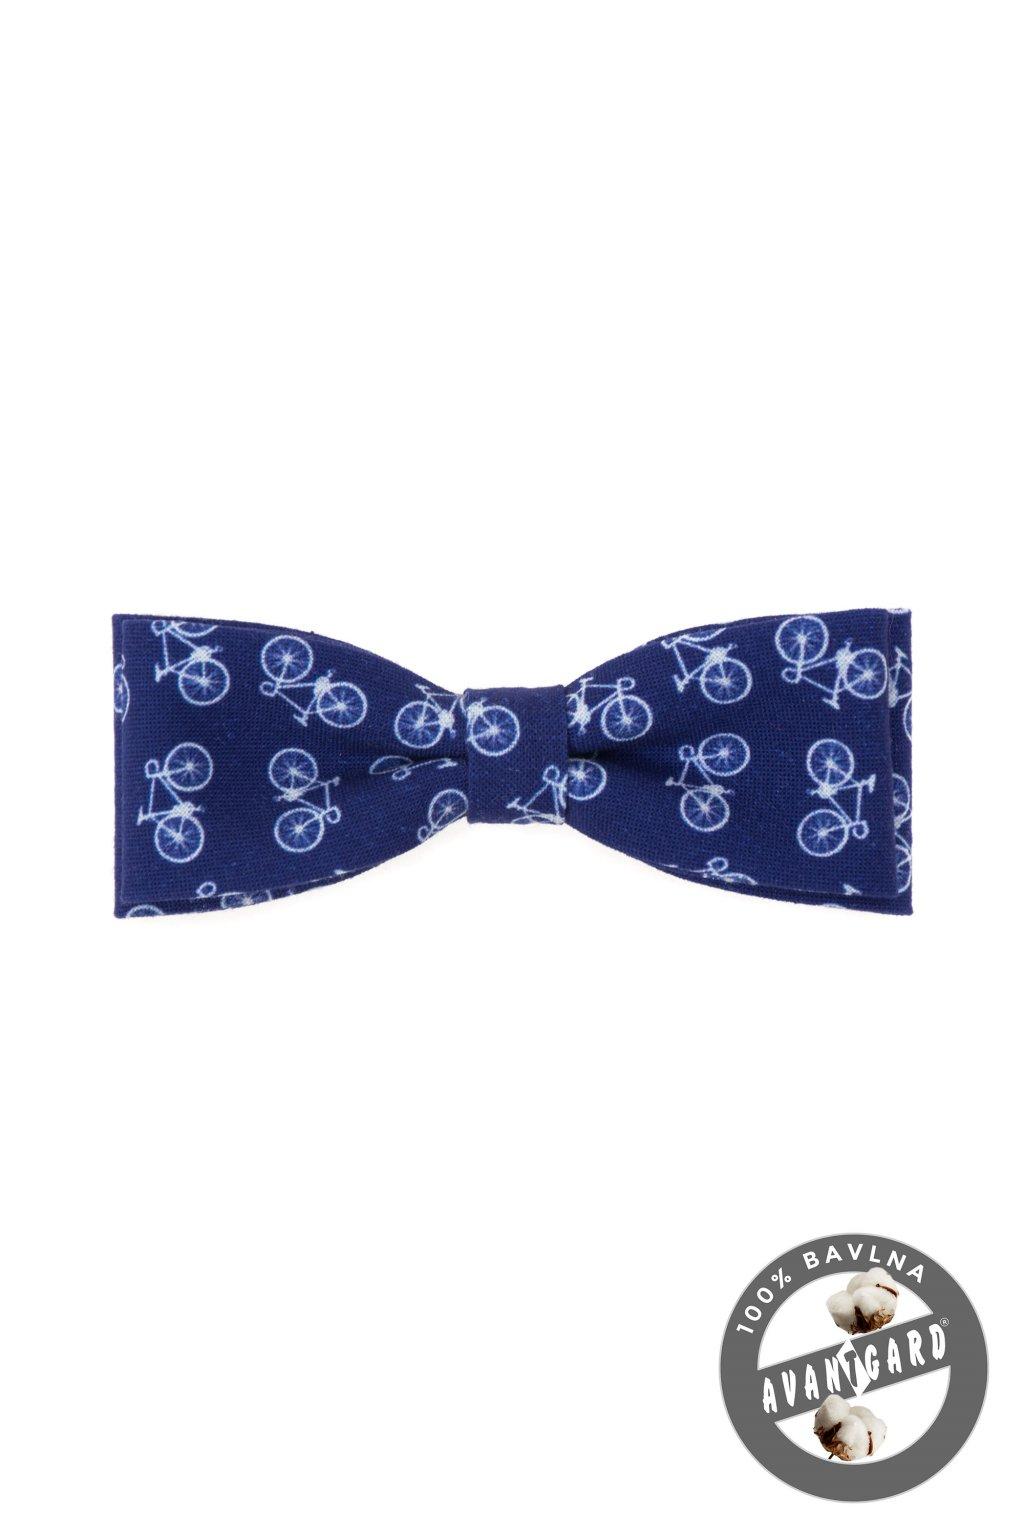 Motýlek KLASIK bavlněný modrá/cyklistika 576 - 250